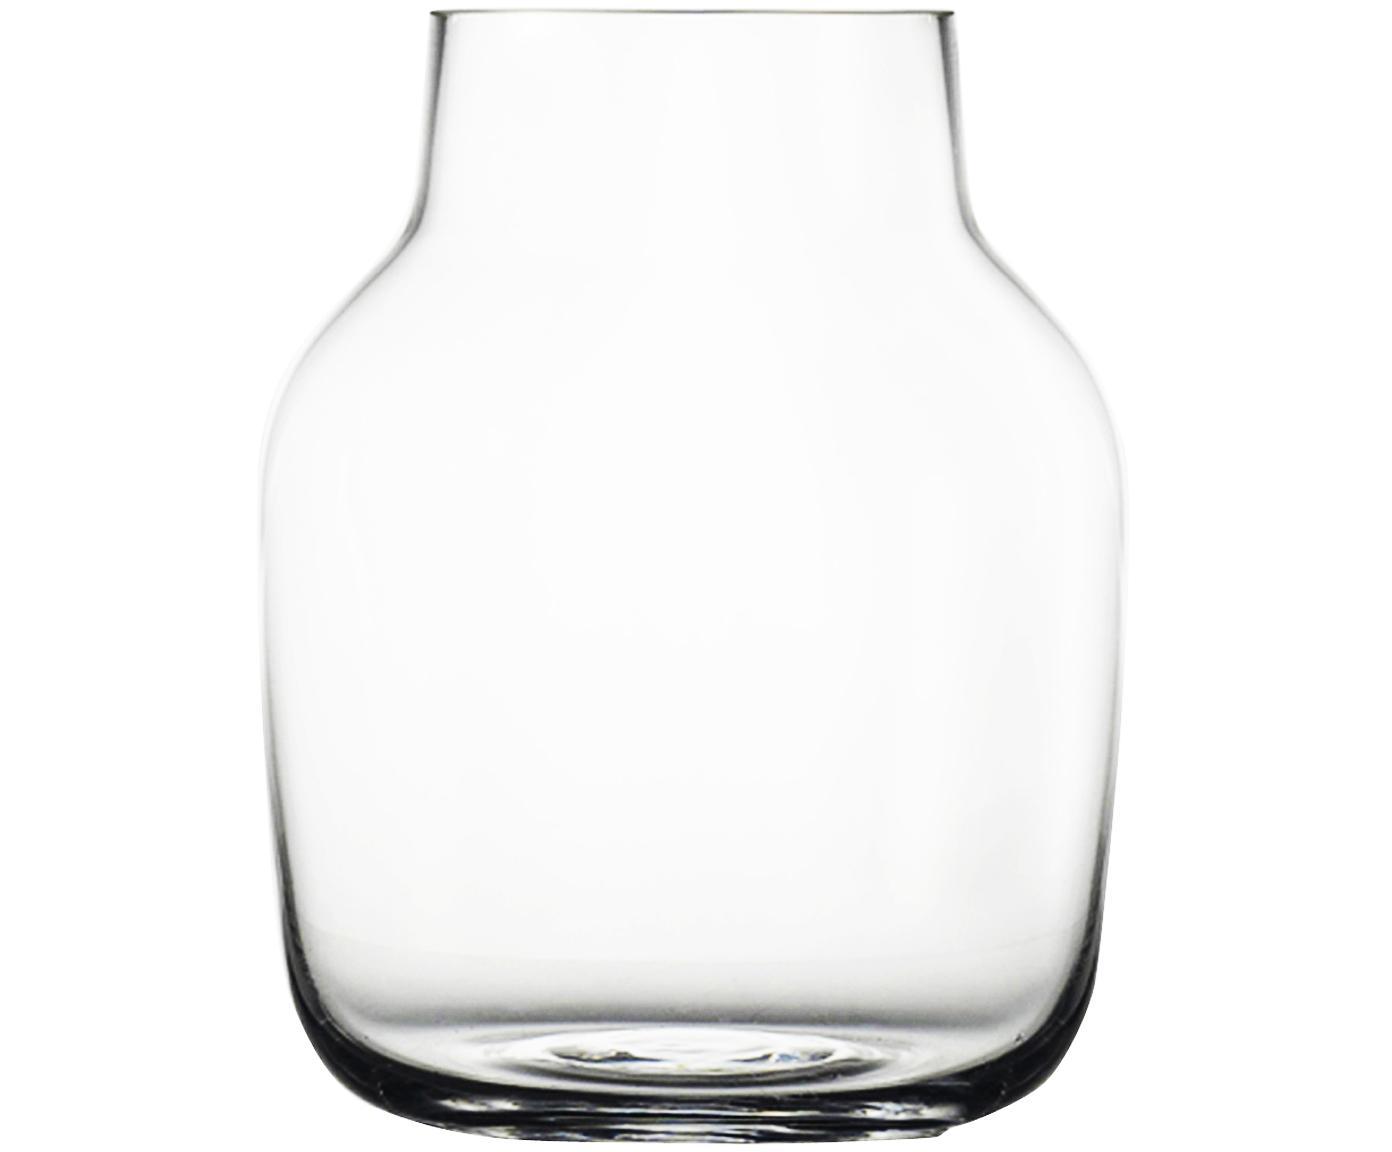 Mundgeblasene Design-Vase Silent, Glas, Transparent, H 19 cm